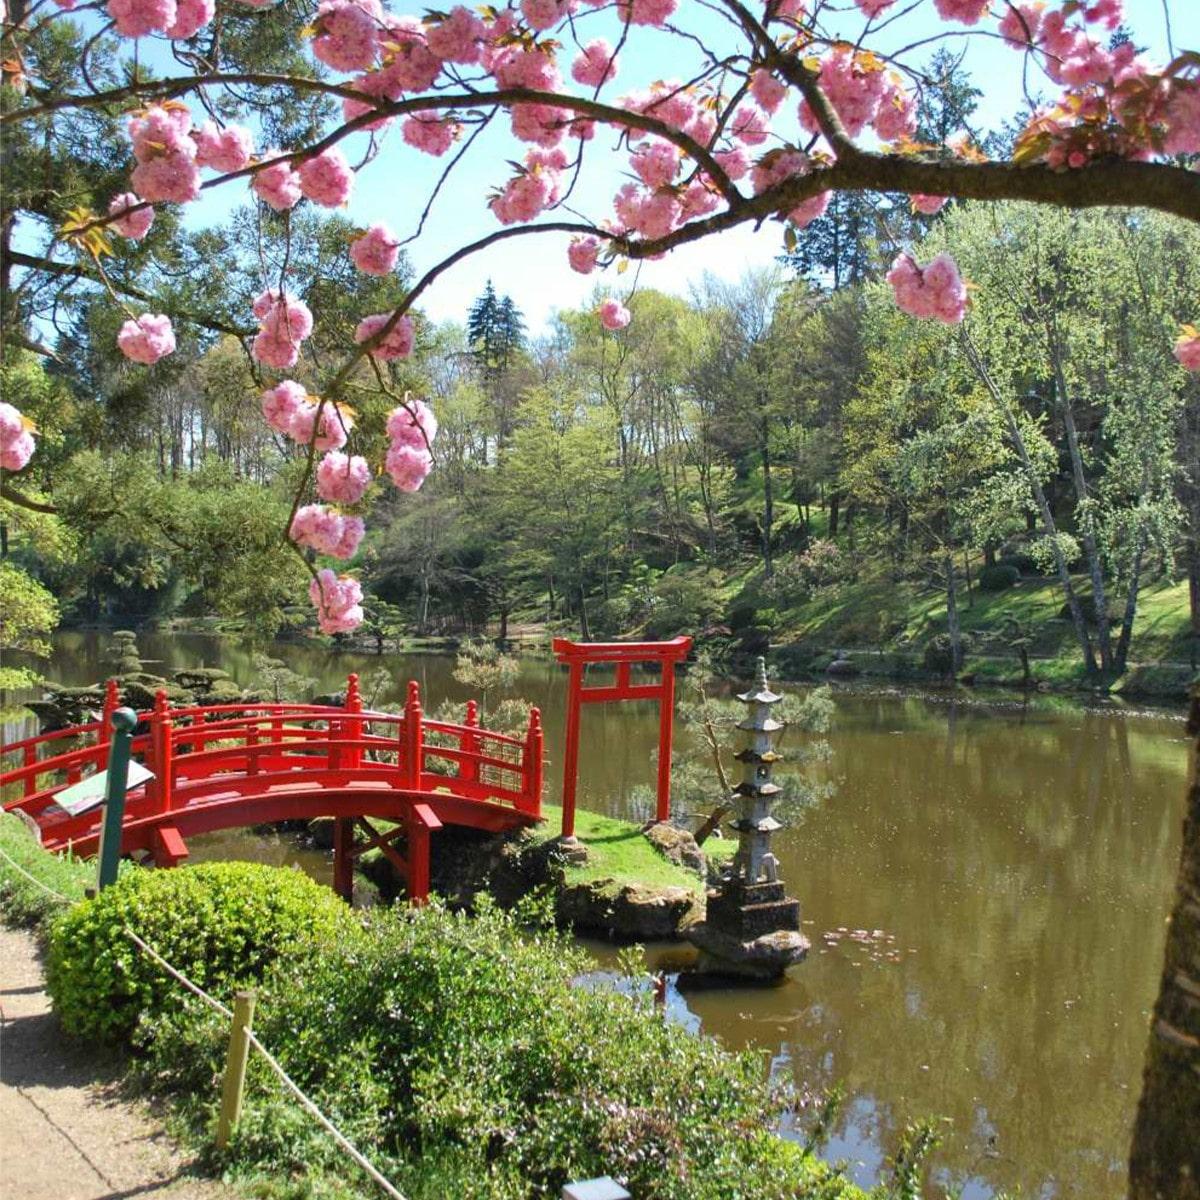 ATECH-public-japanese-bench-park-france